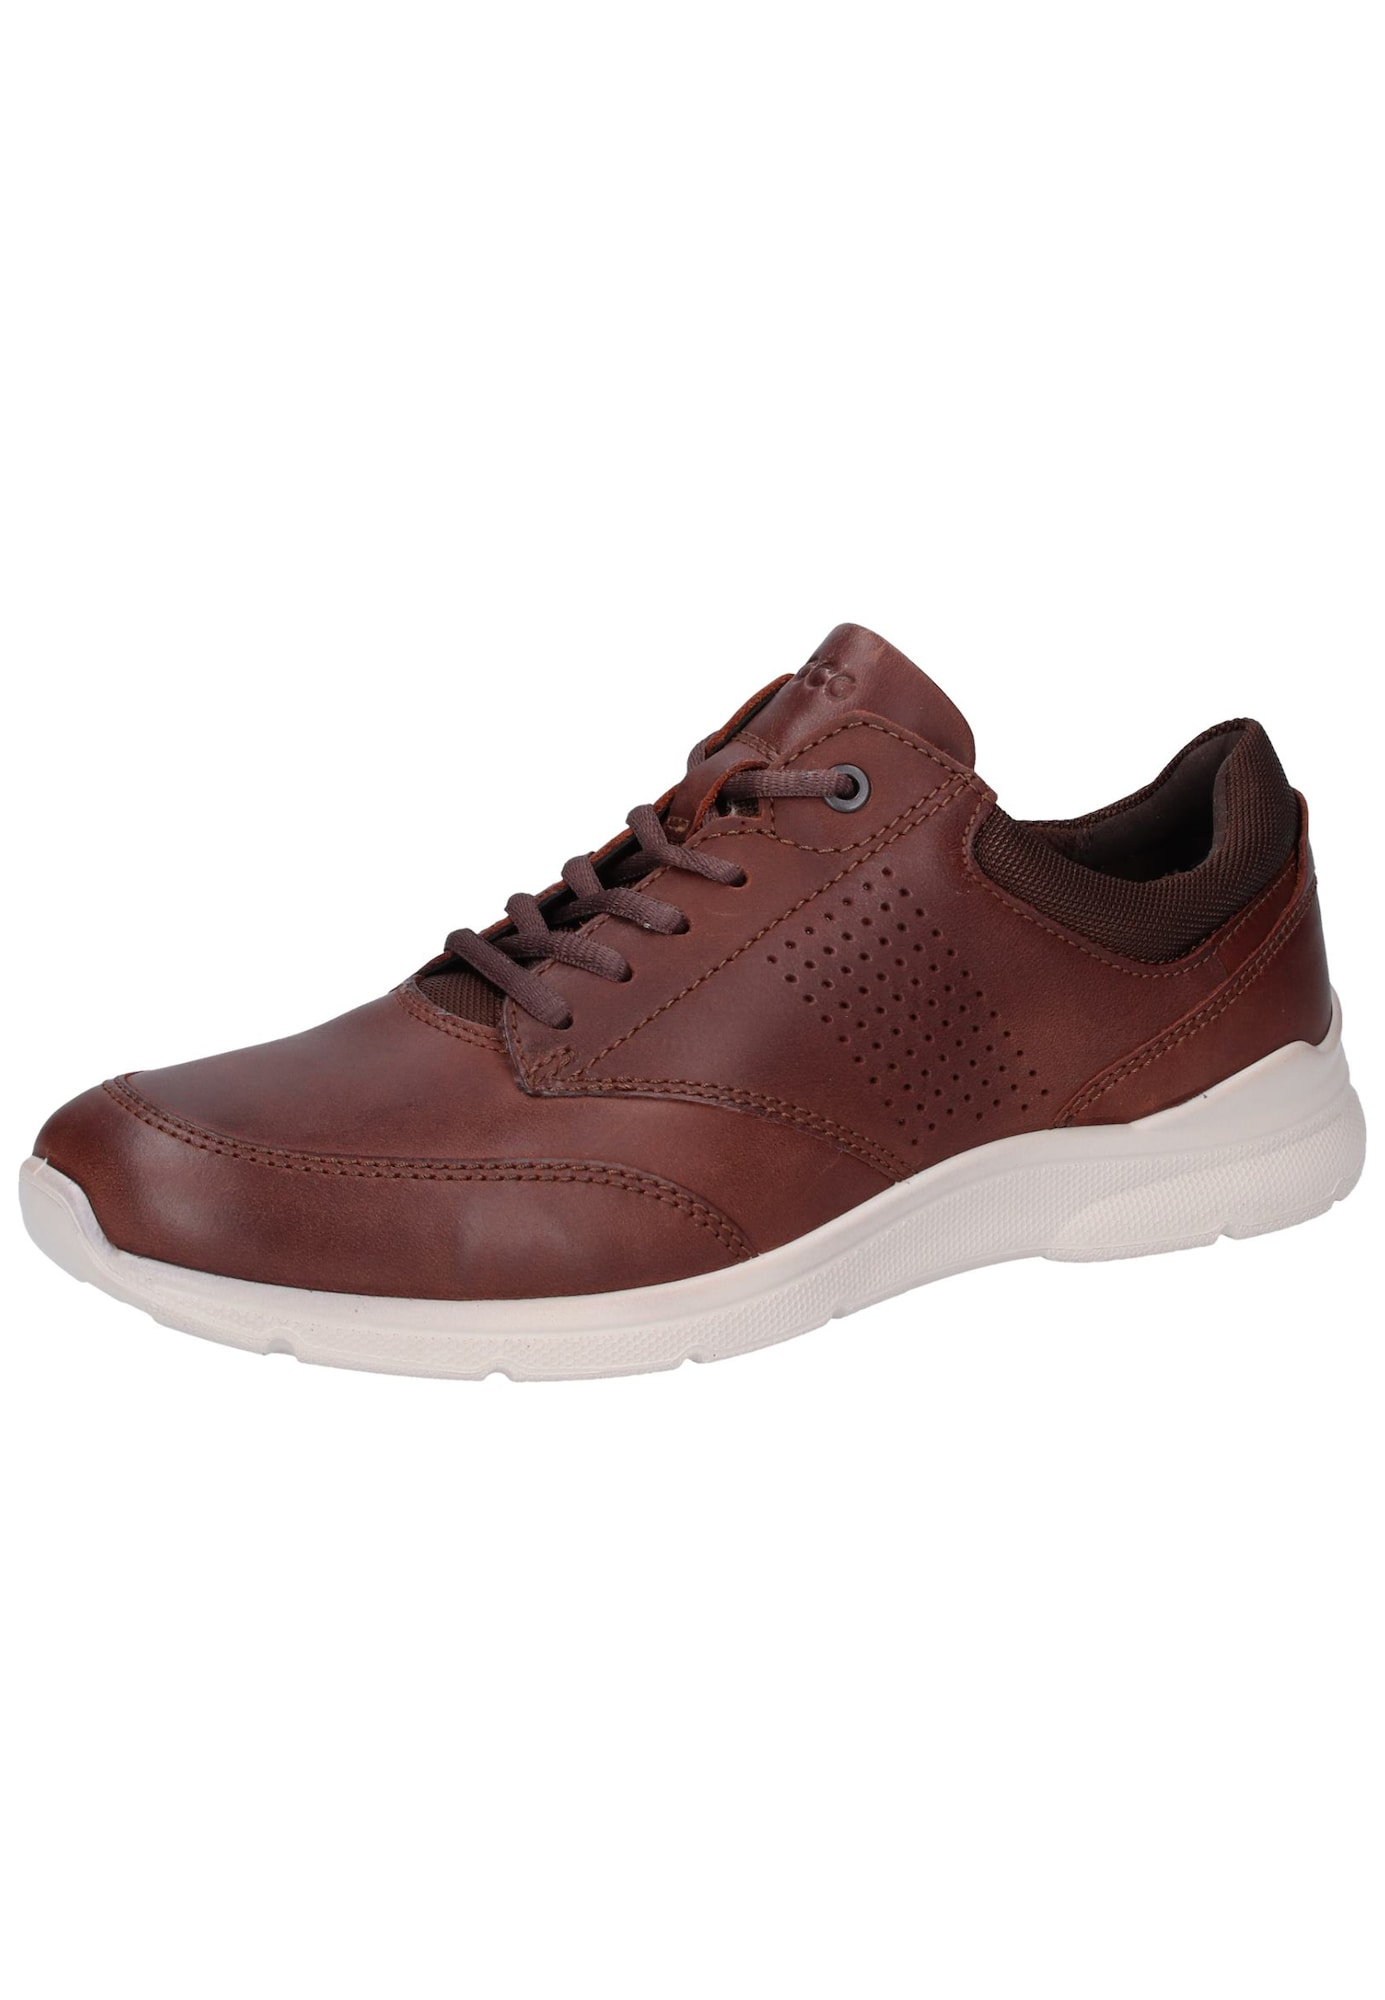 Halbschuhe | Schuhe > Boots | Braun | ECCO